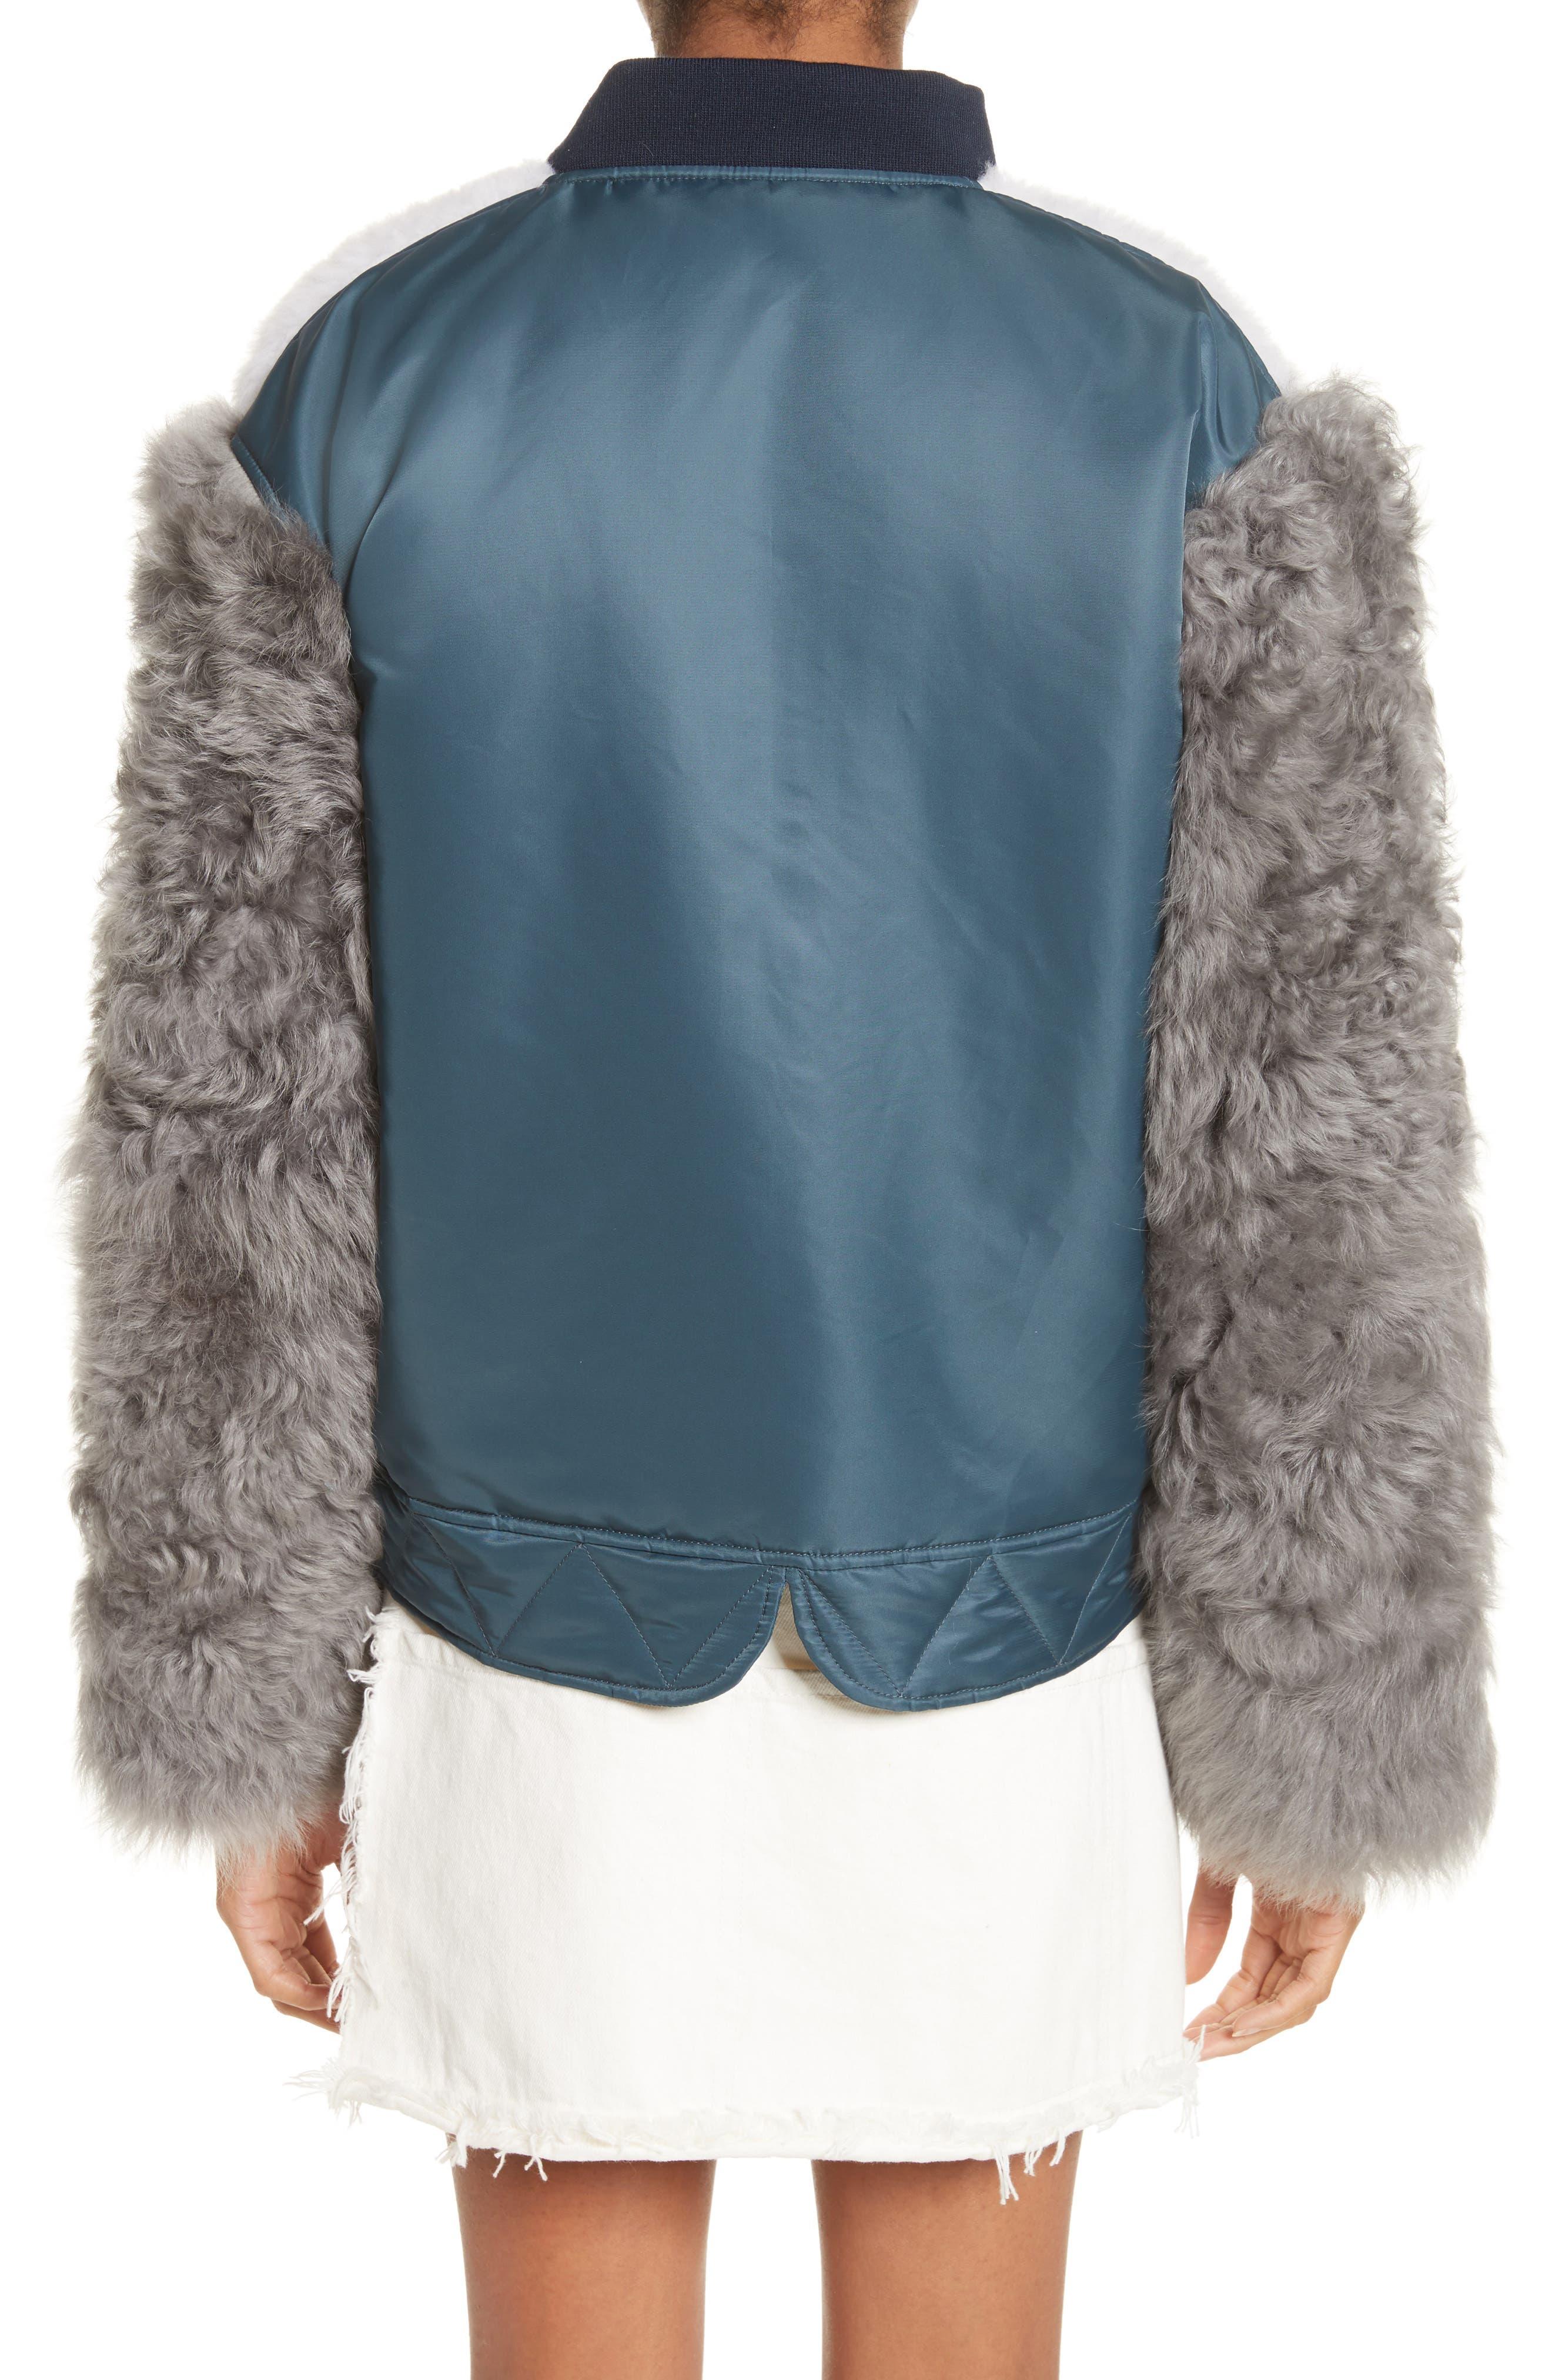 Peter Genuine Shearling Sleeve Jacket,                             Alternate thumbnail 2, color,                             410